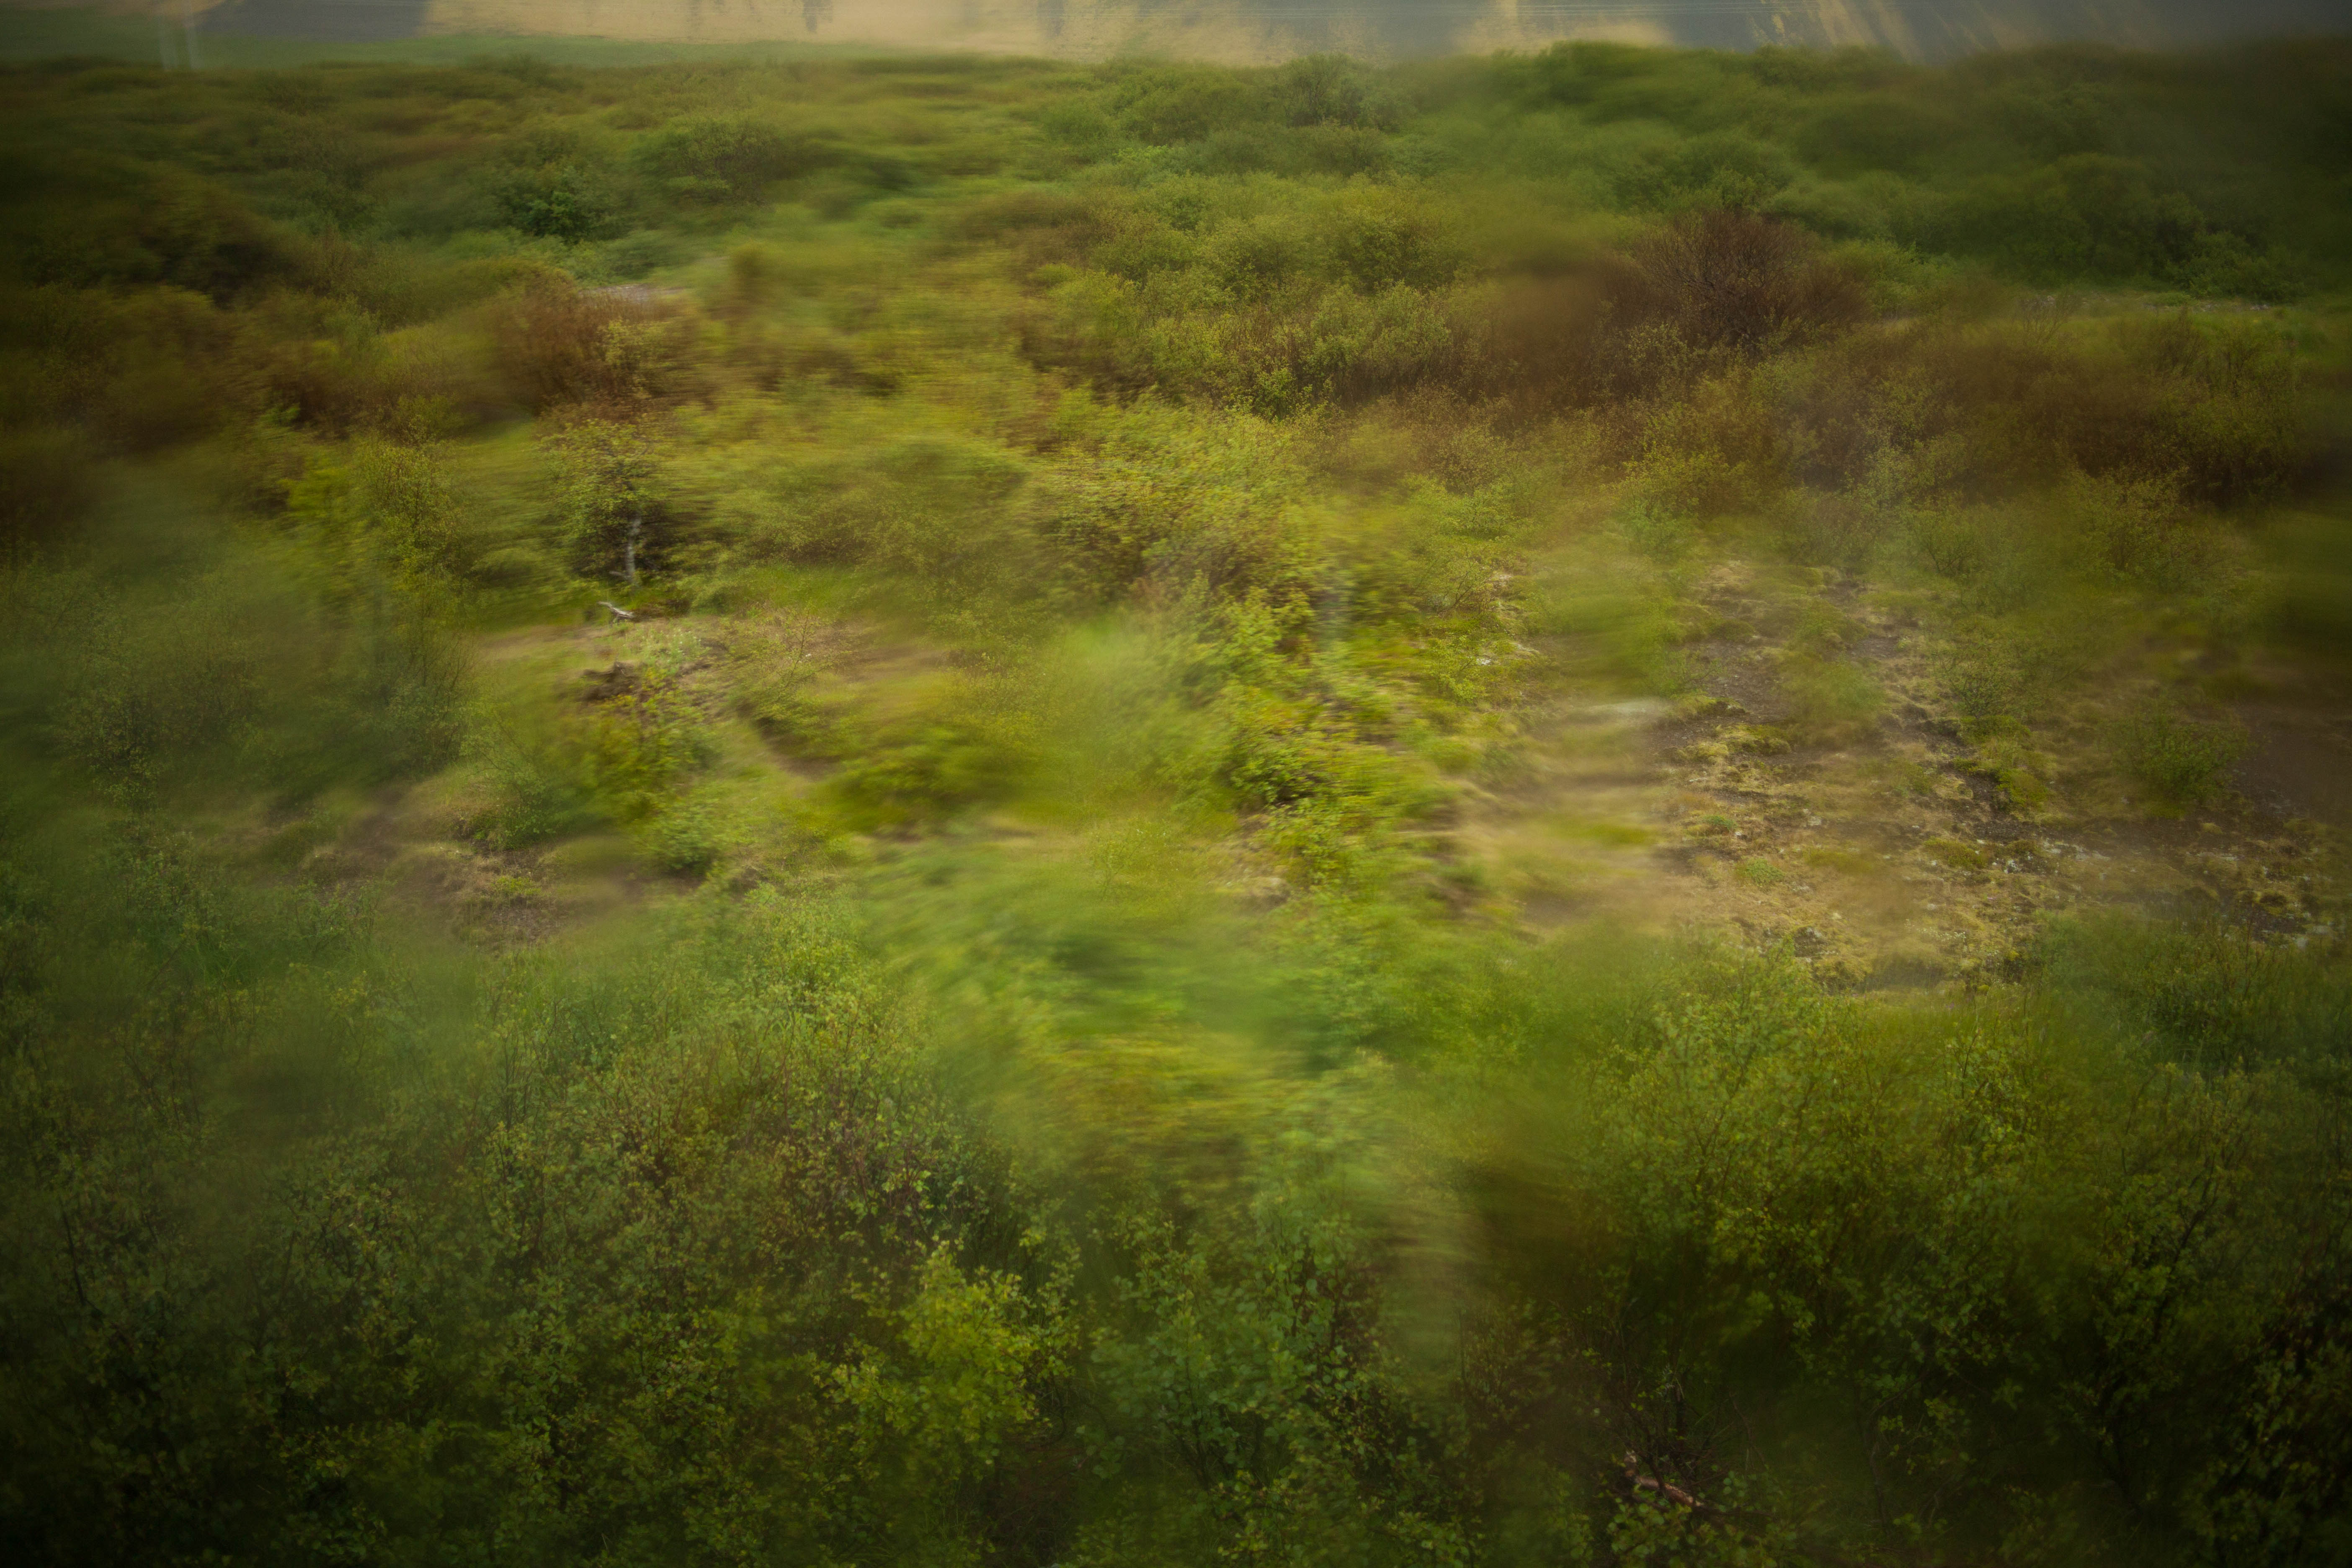 landscape through glass